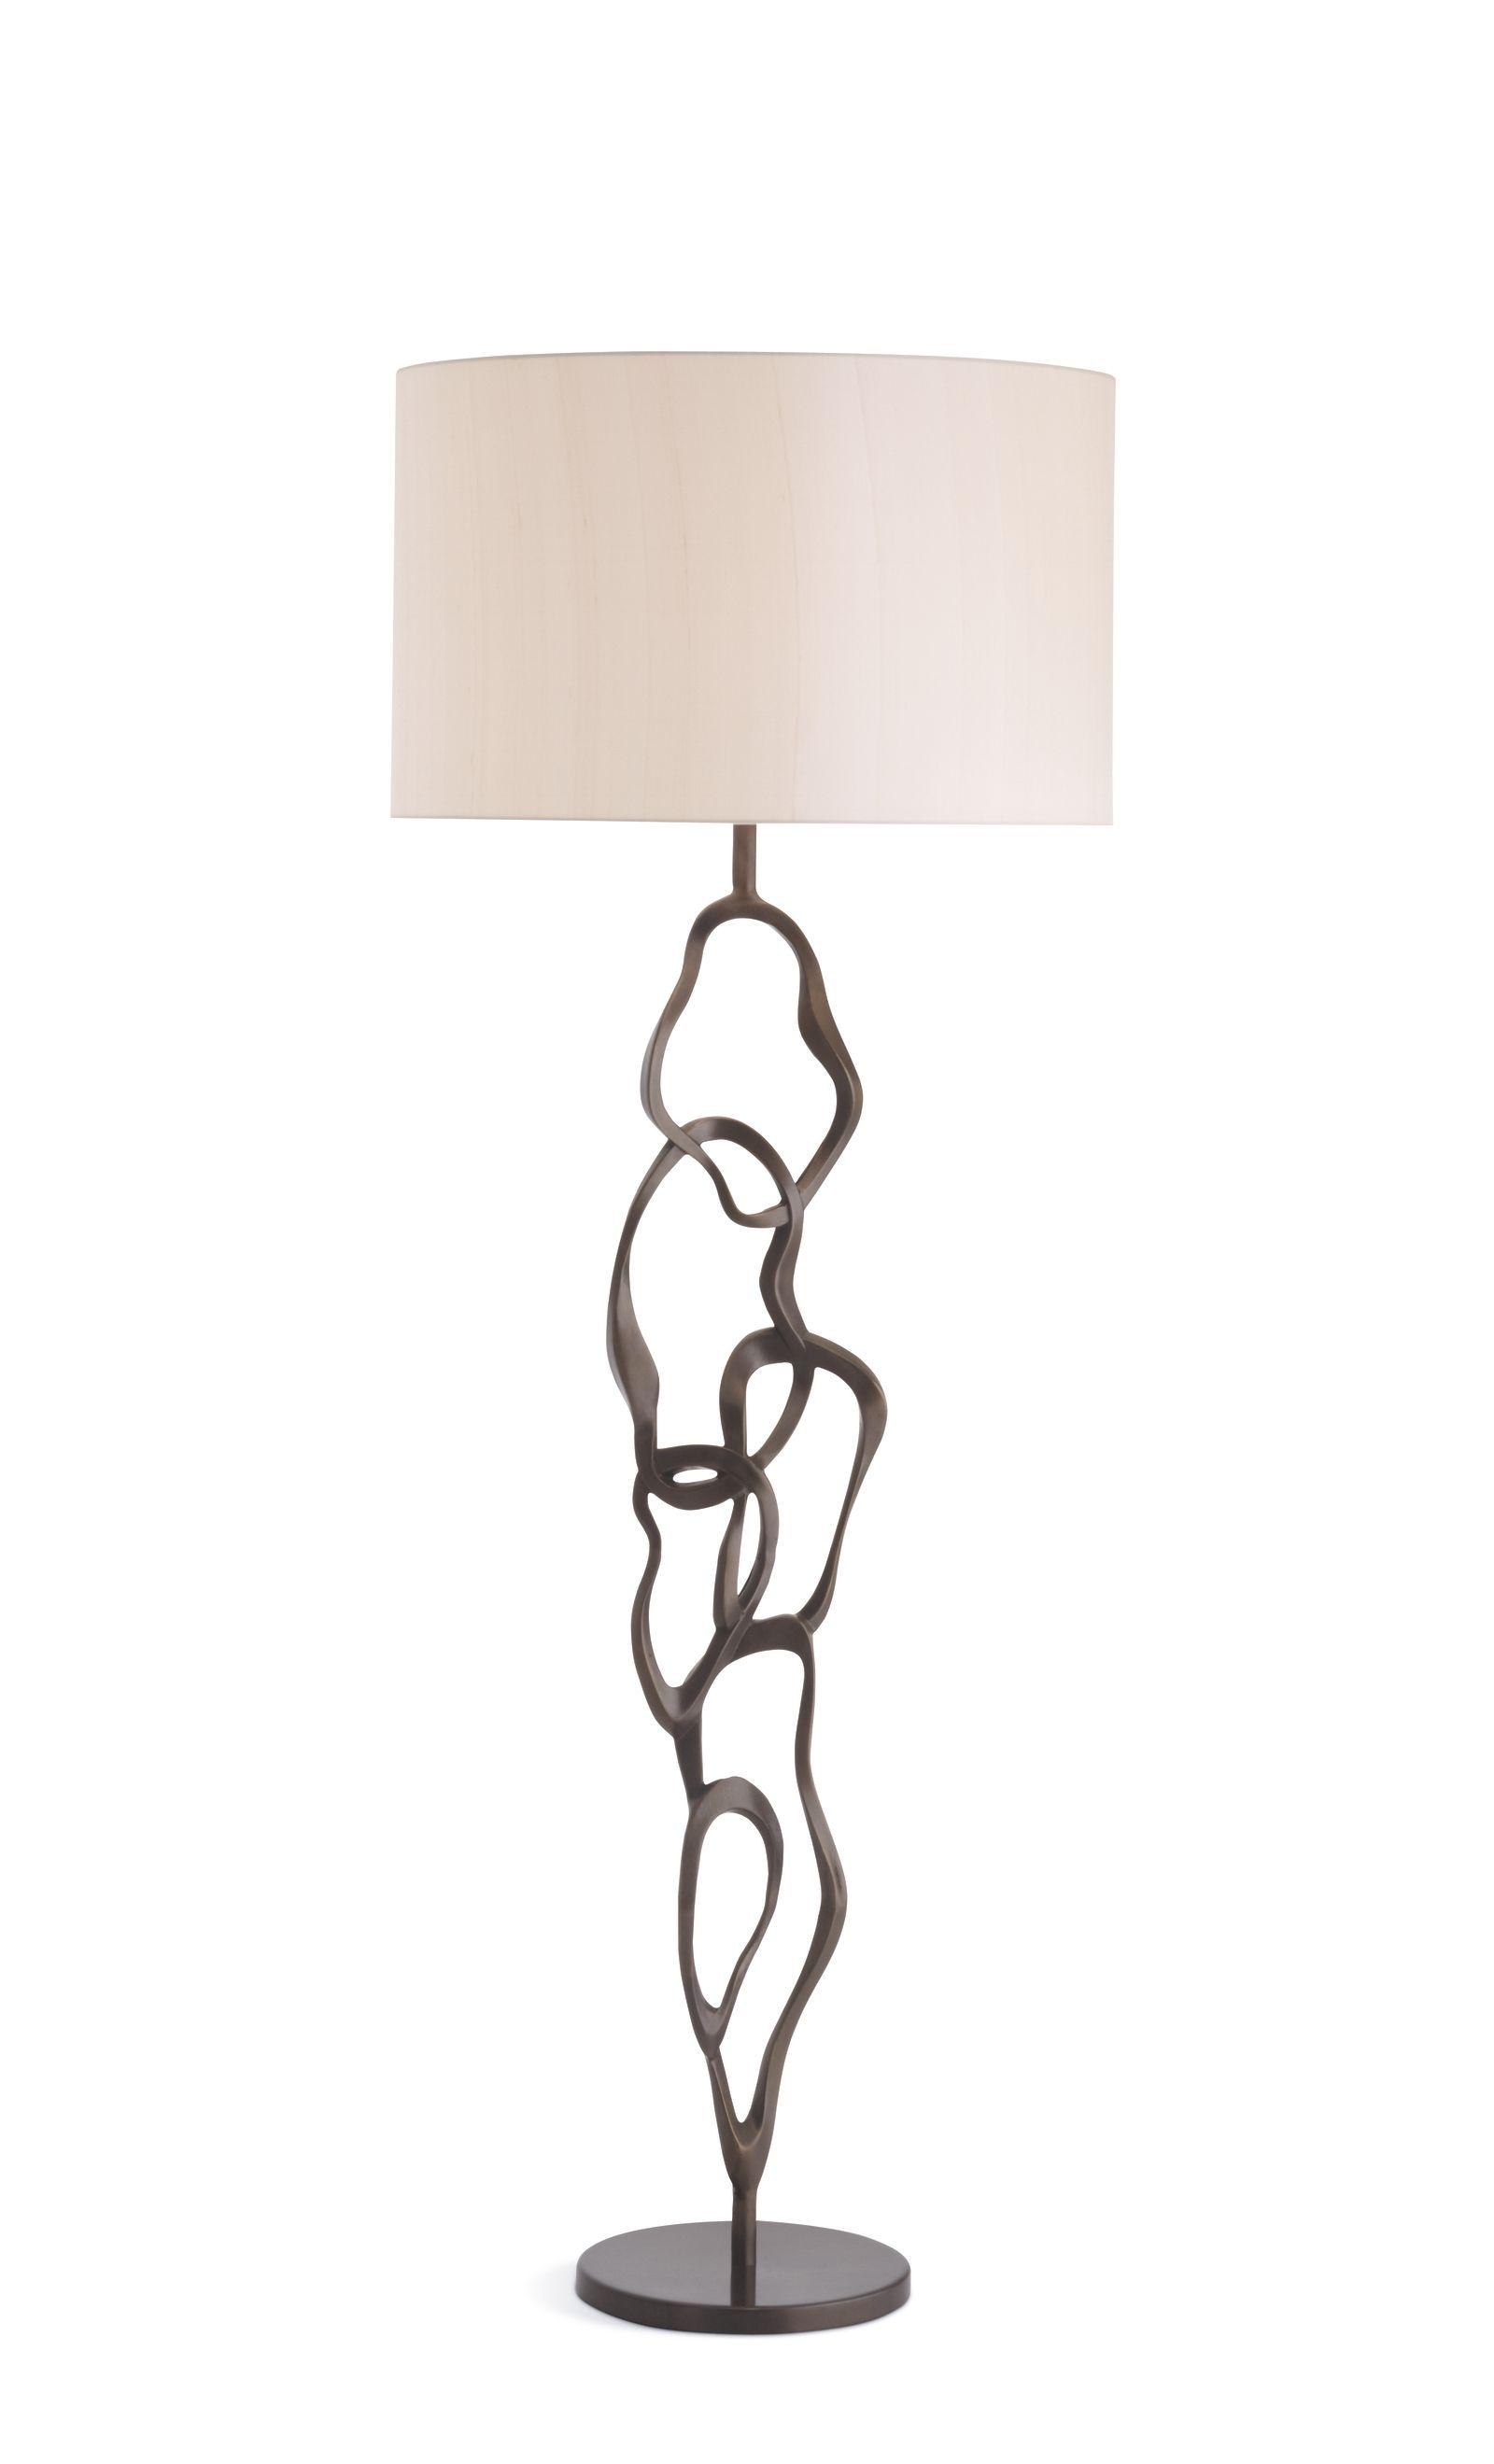 Mode floor lamp in dark bronze baker furniture light floor mode floor lamp in dark bronze baker furniture mozeypictures Image collections